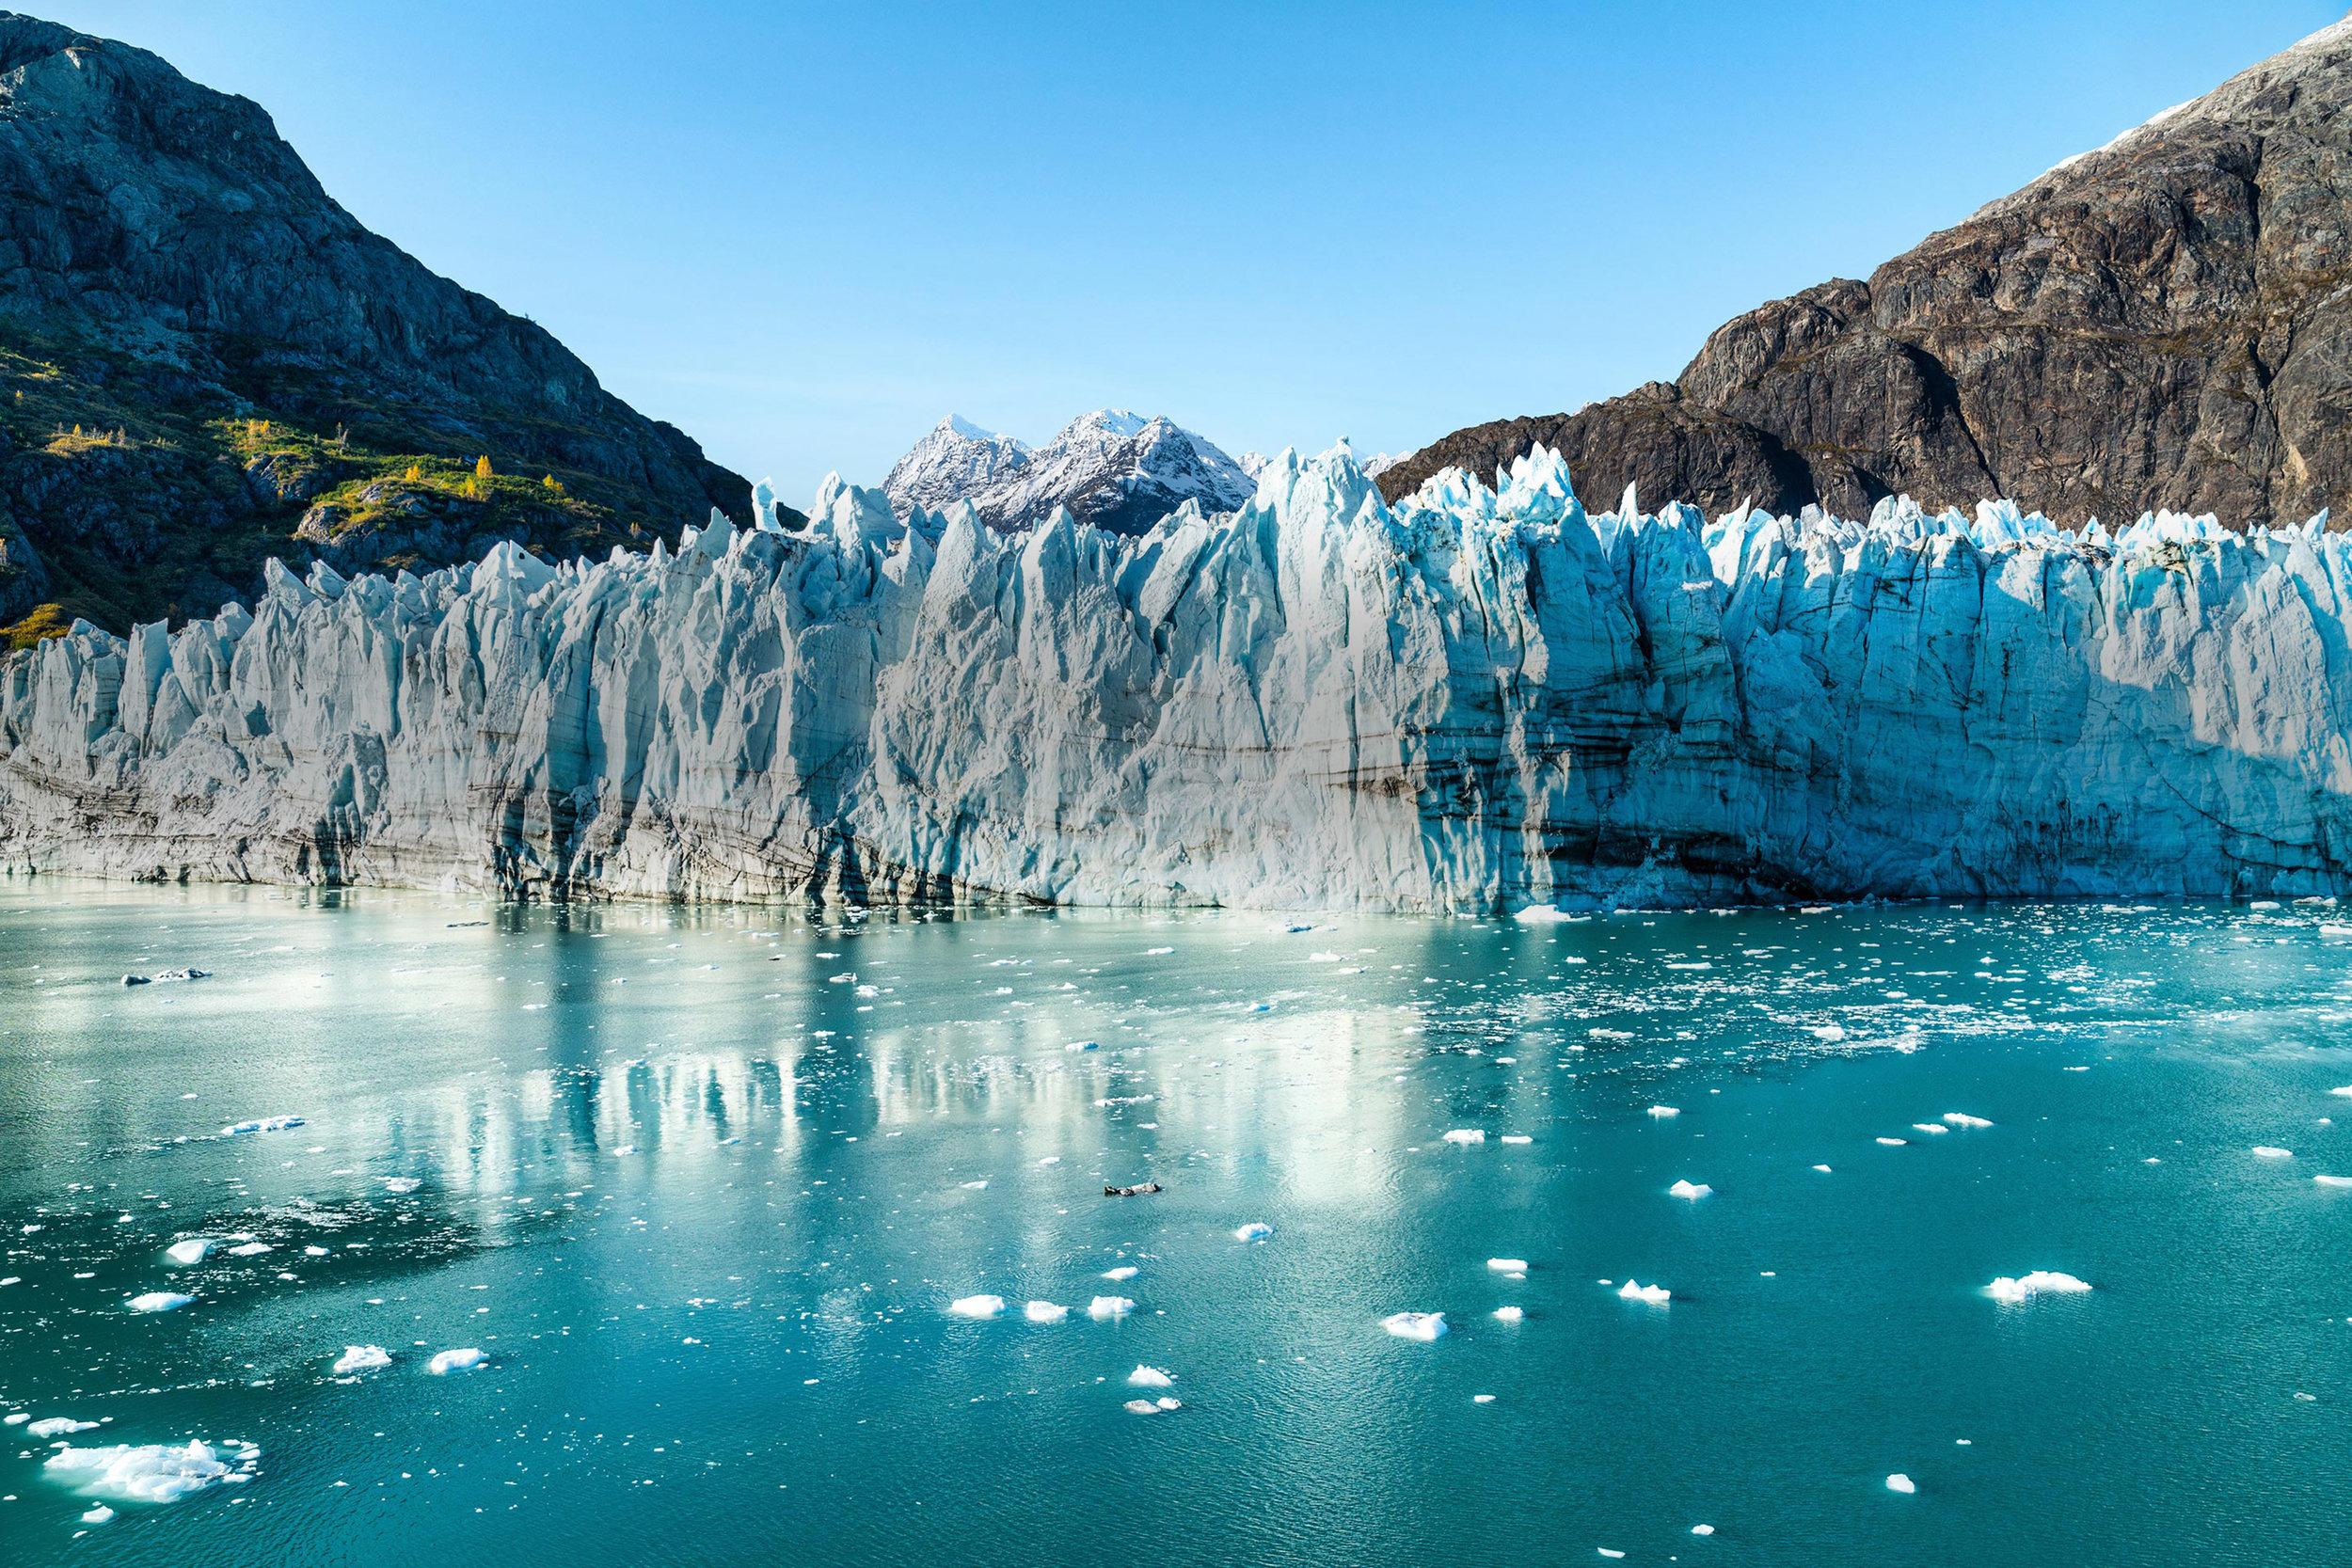 alaska-glacier-bay-from-cruise-ship.jpg